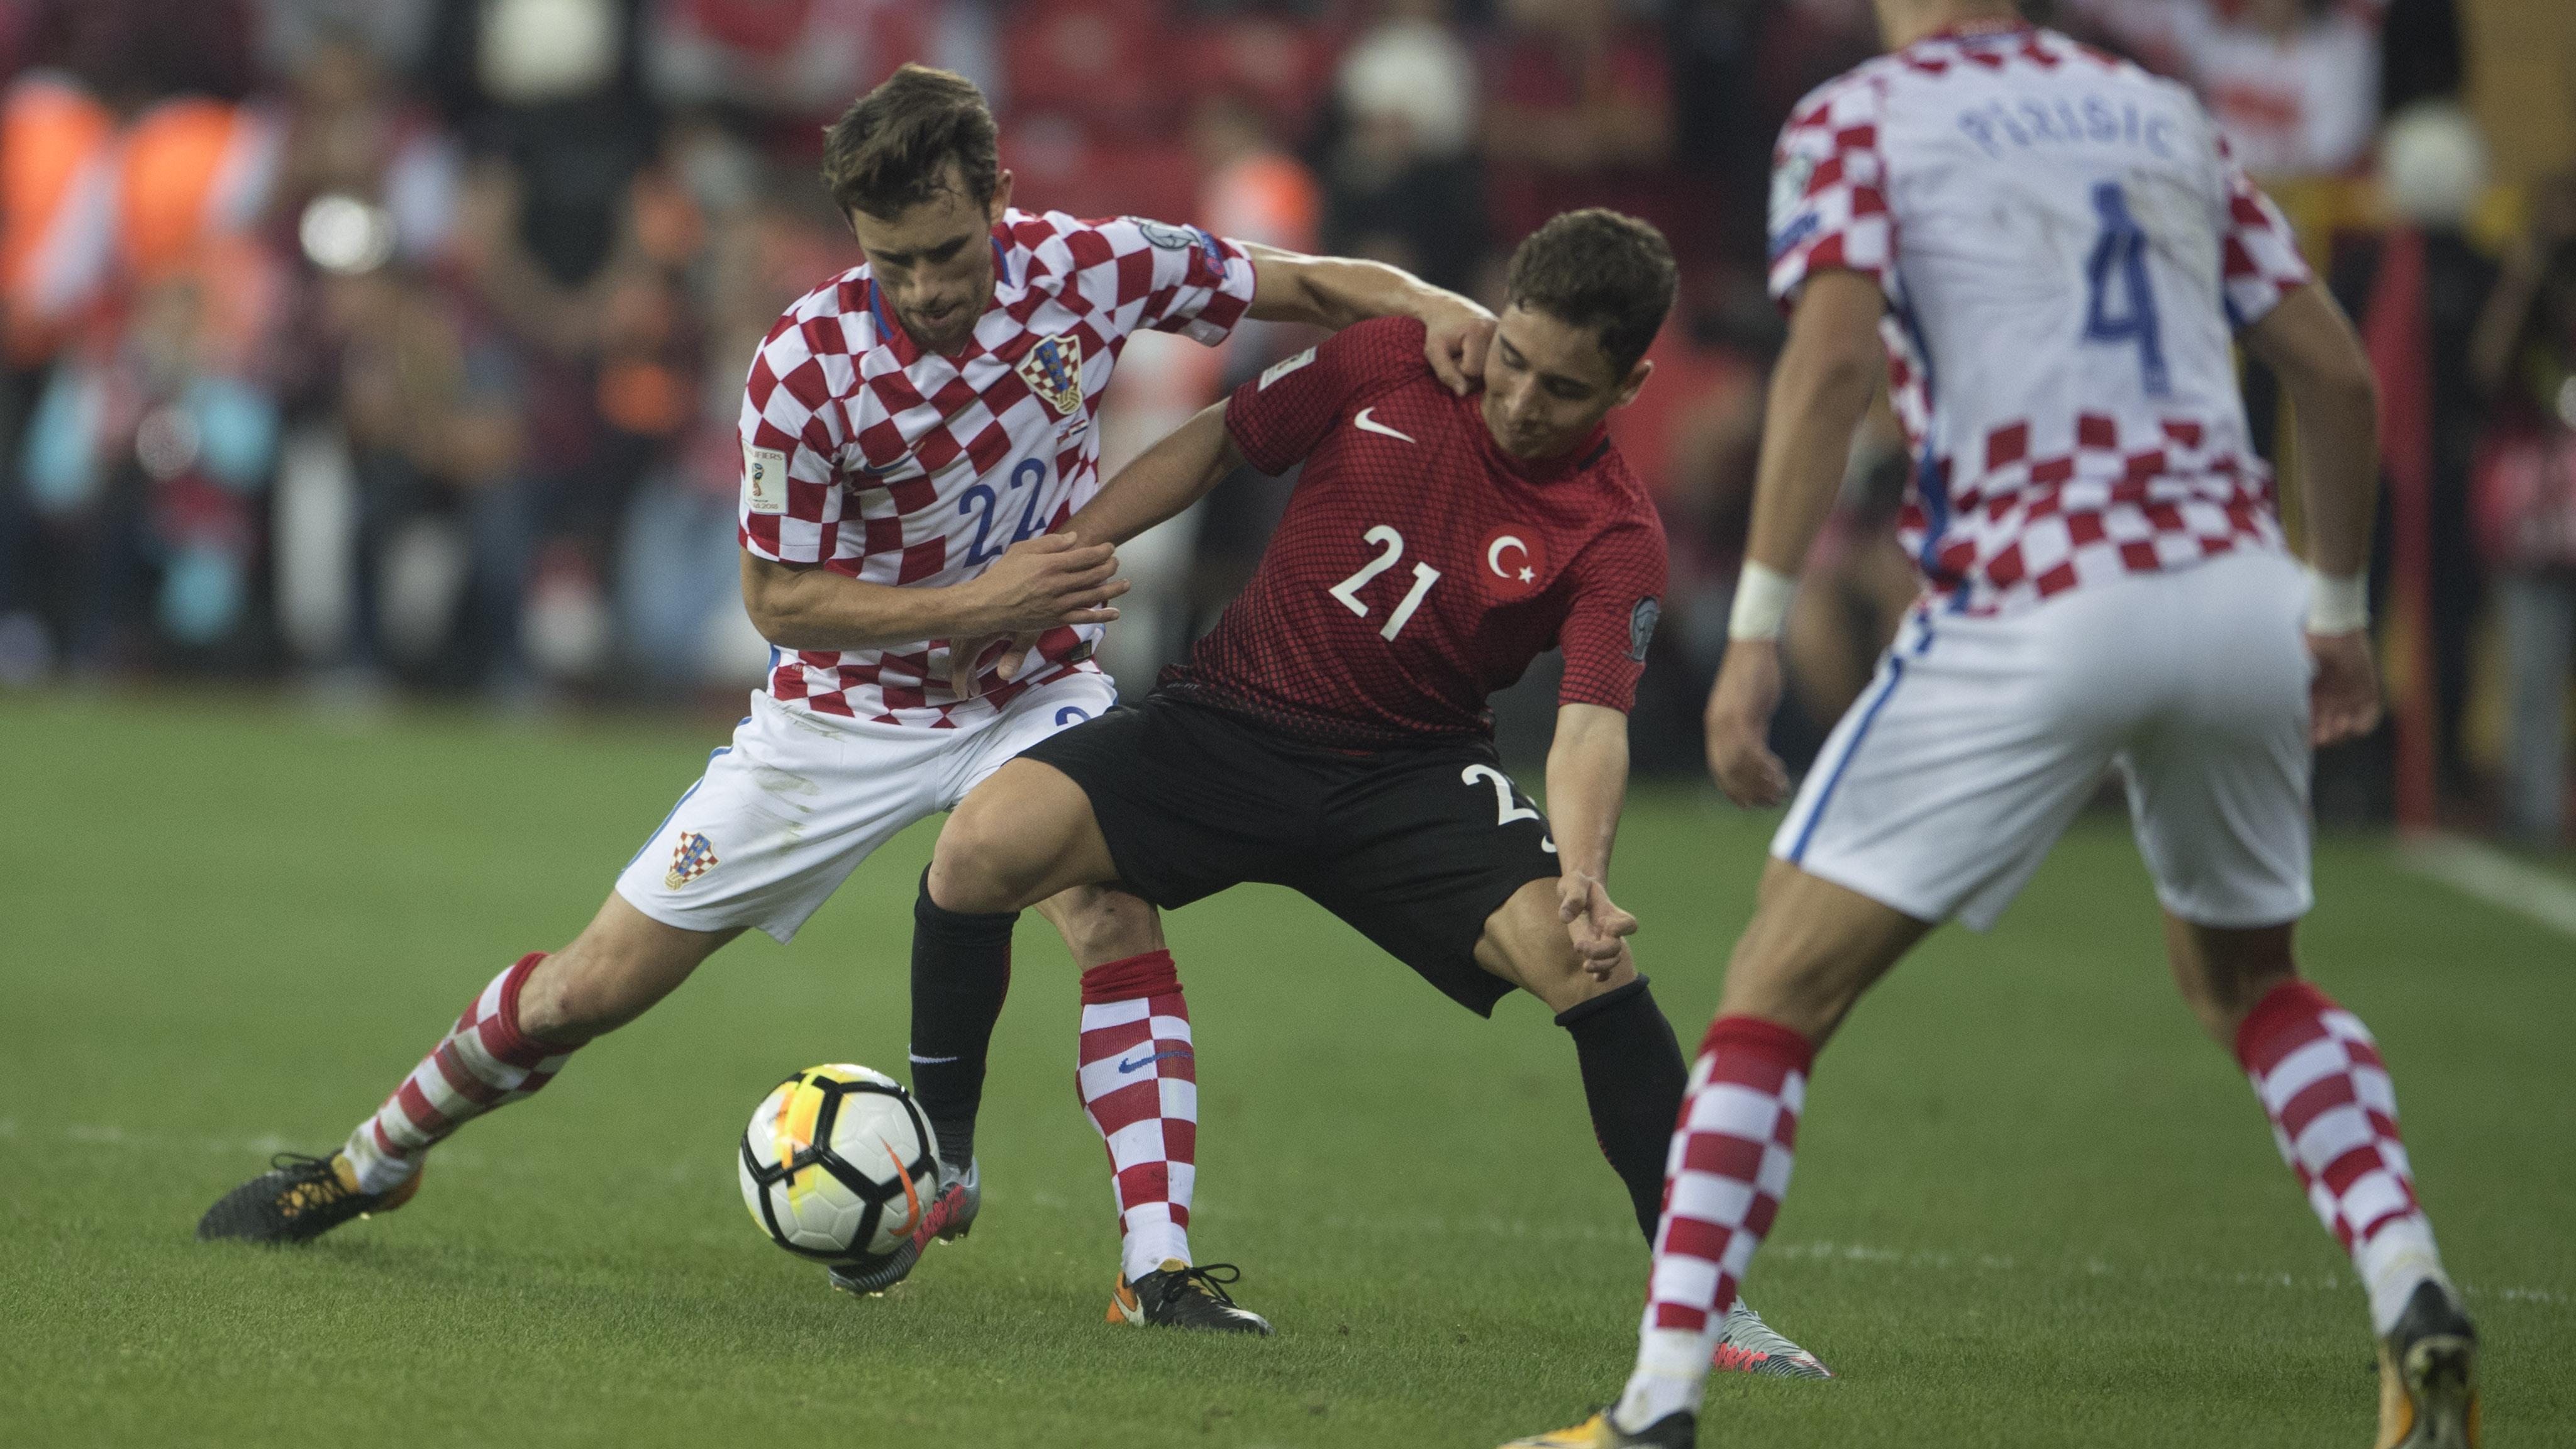 b157c5e3d63 Lone Turkey goal leaves Croatia empty-handed - Croatian Football ...